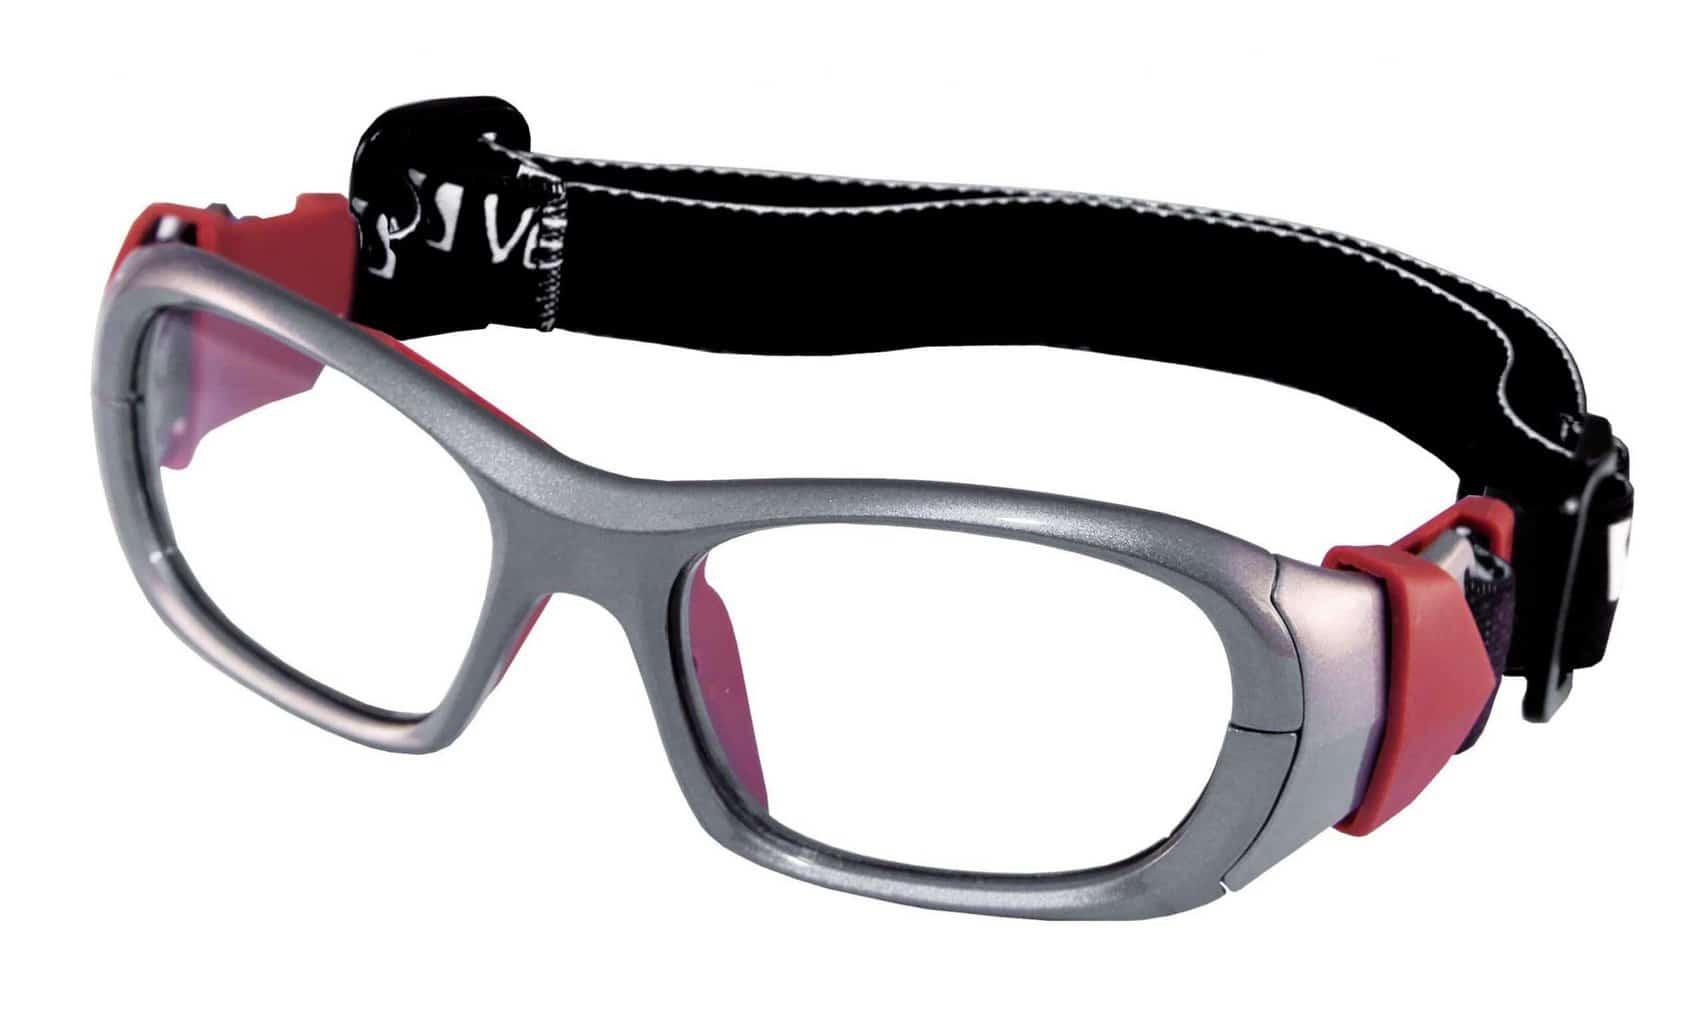 Olimpo goggles